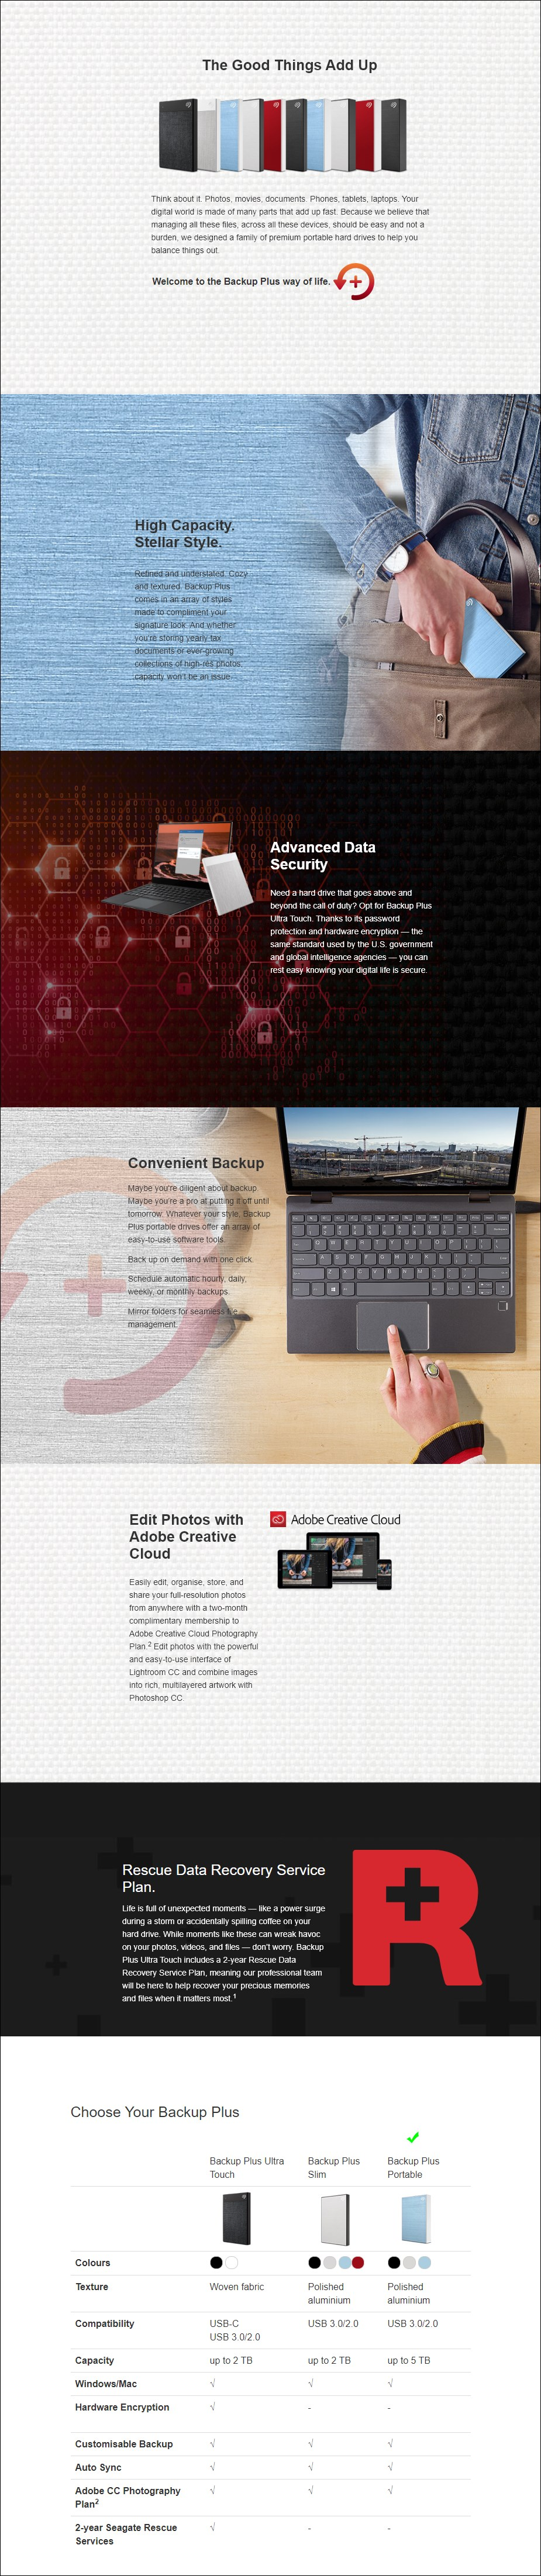 seagate-backup-plus-5tb-usb-30-portable-external-hard-drive-black-sthp5000400-ac27836-1.jpg